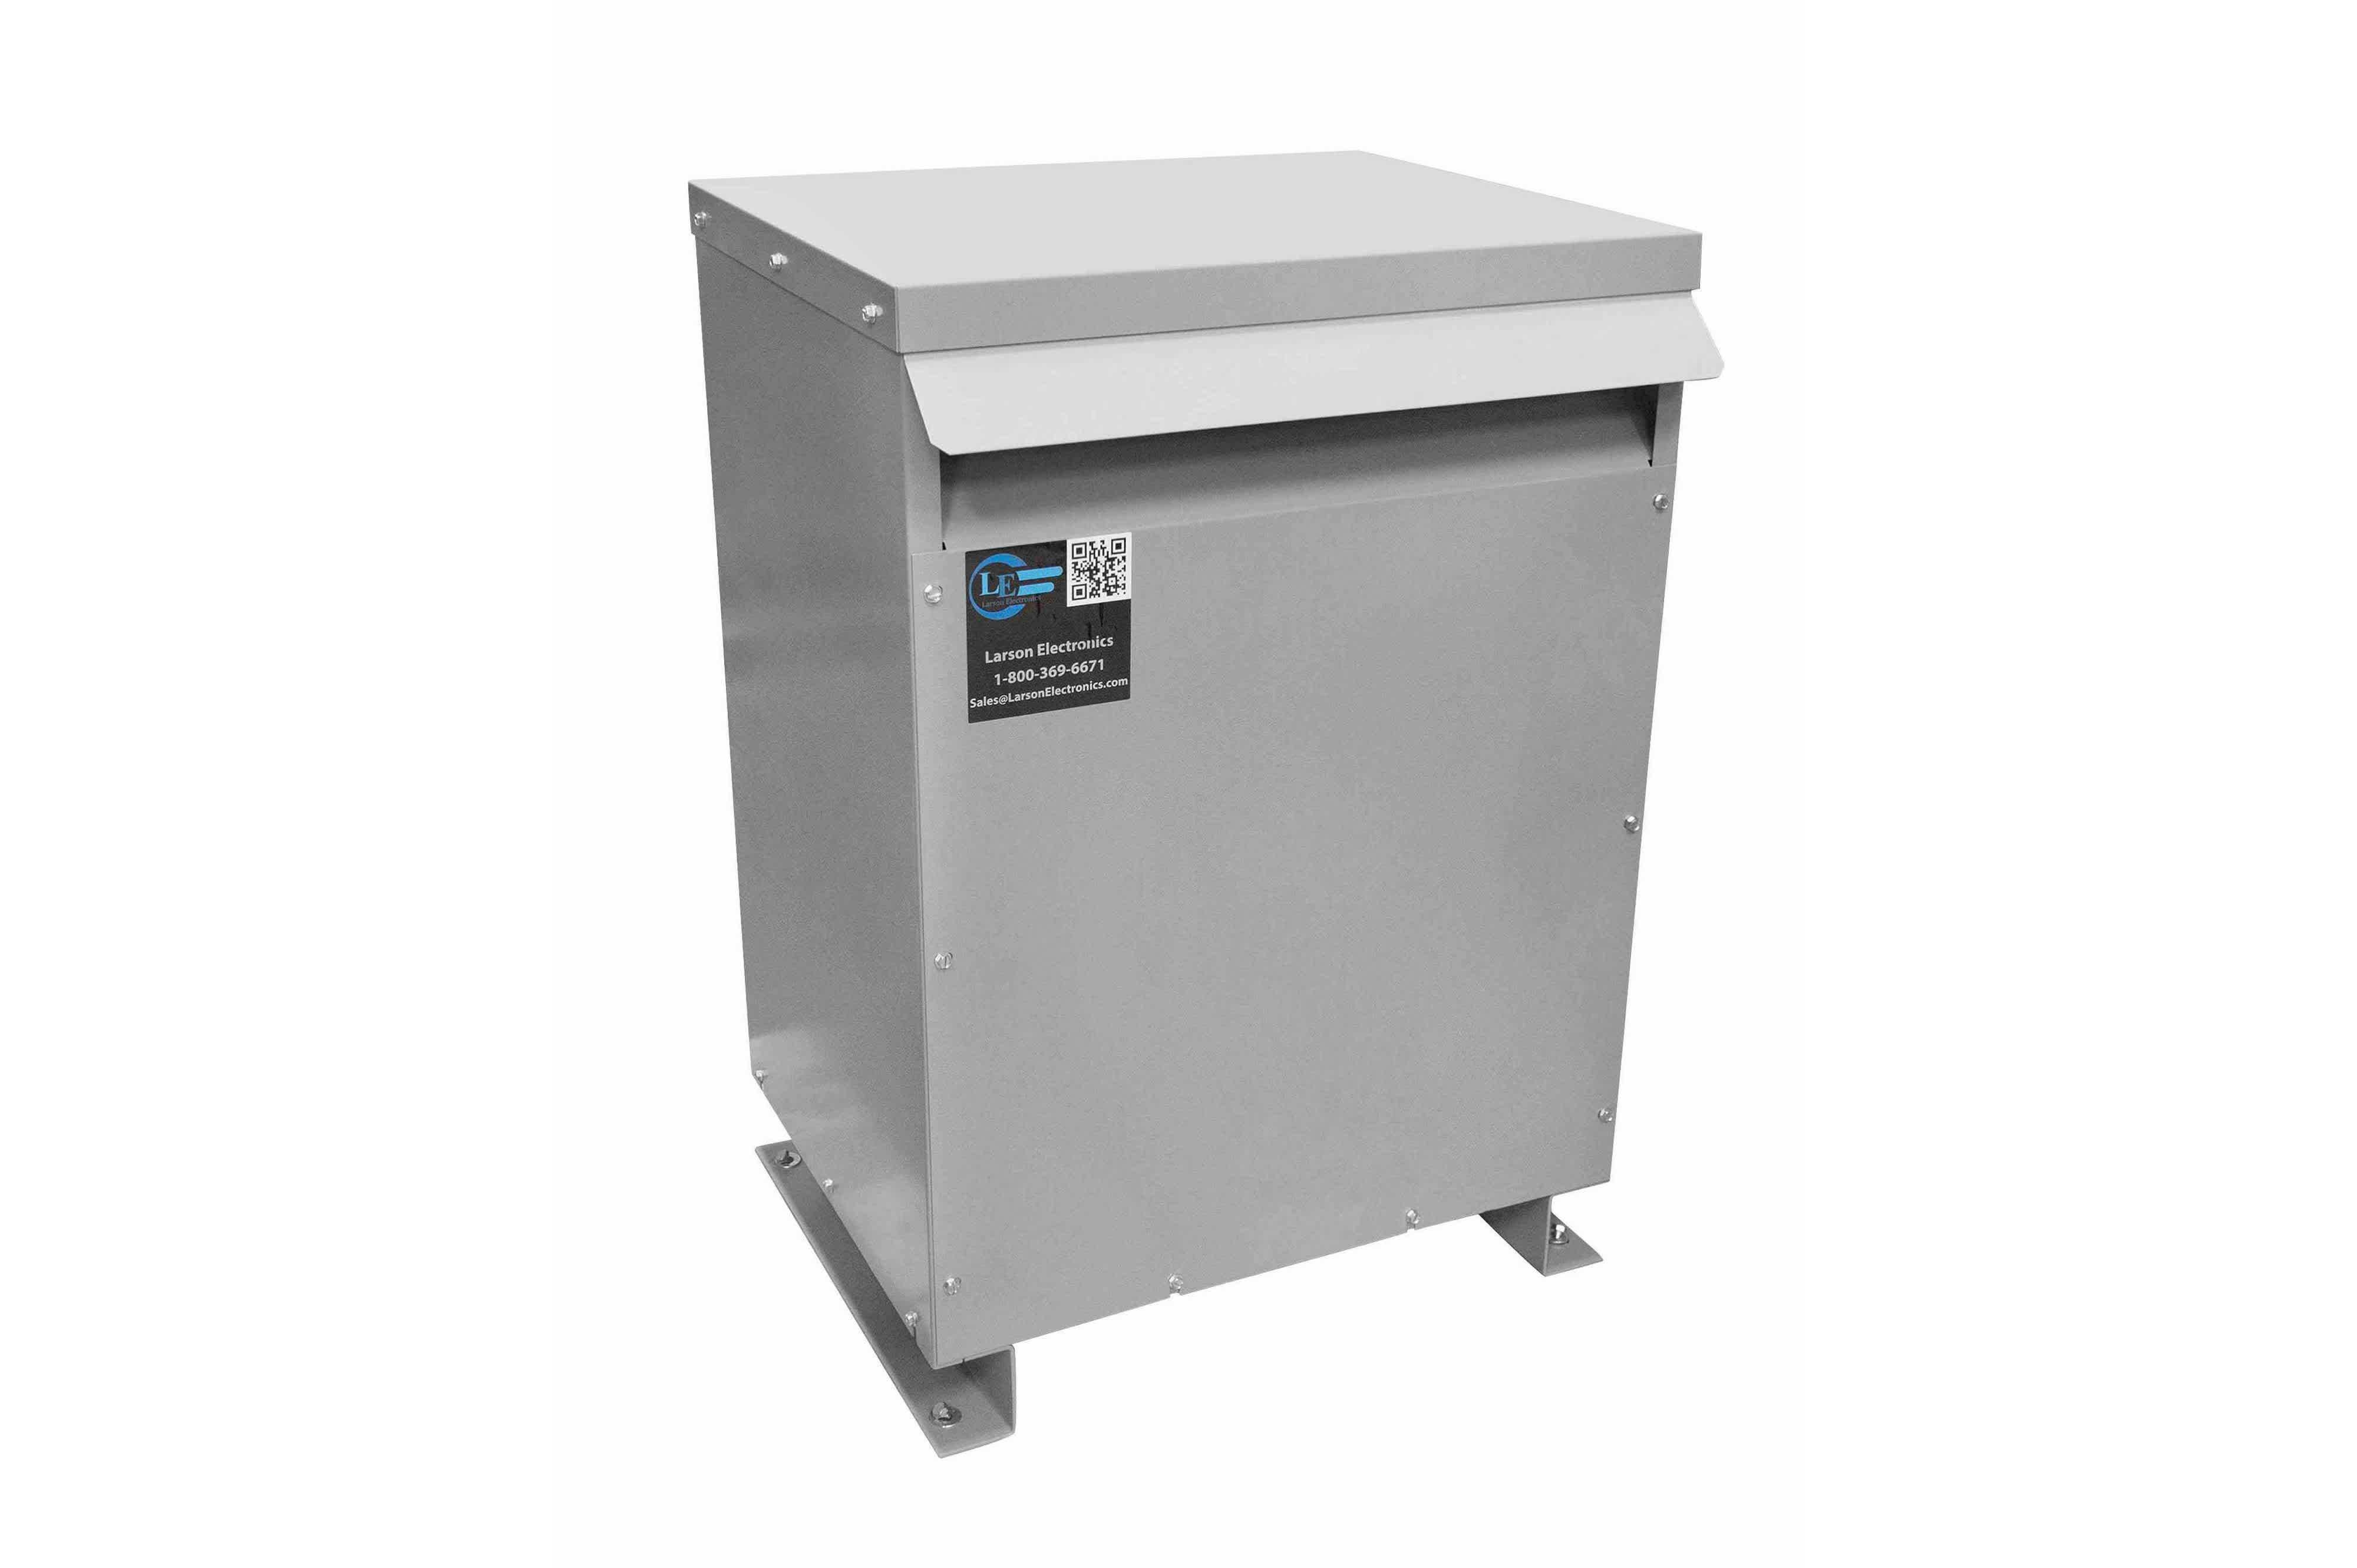 250 kVA 3PH Isolation Transformer, 460V Wye Primary, 600Y/347 Wye-N Secondary, N3R, Ventilated, 60 Hz